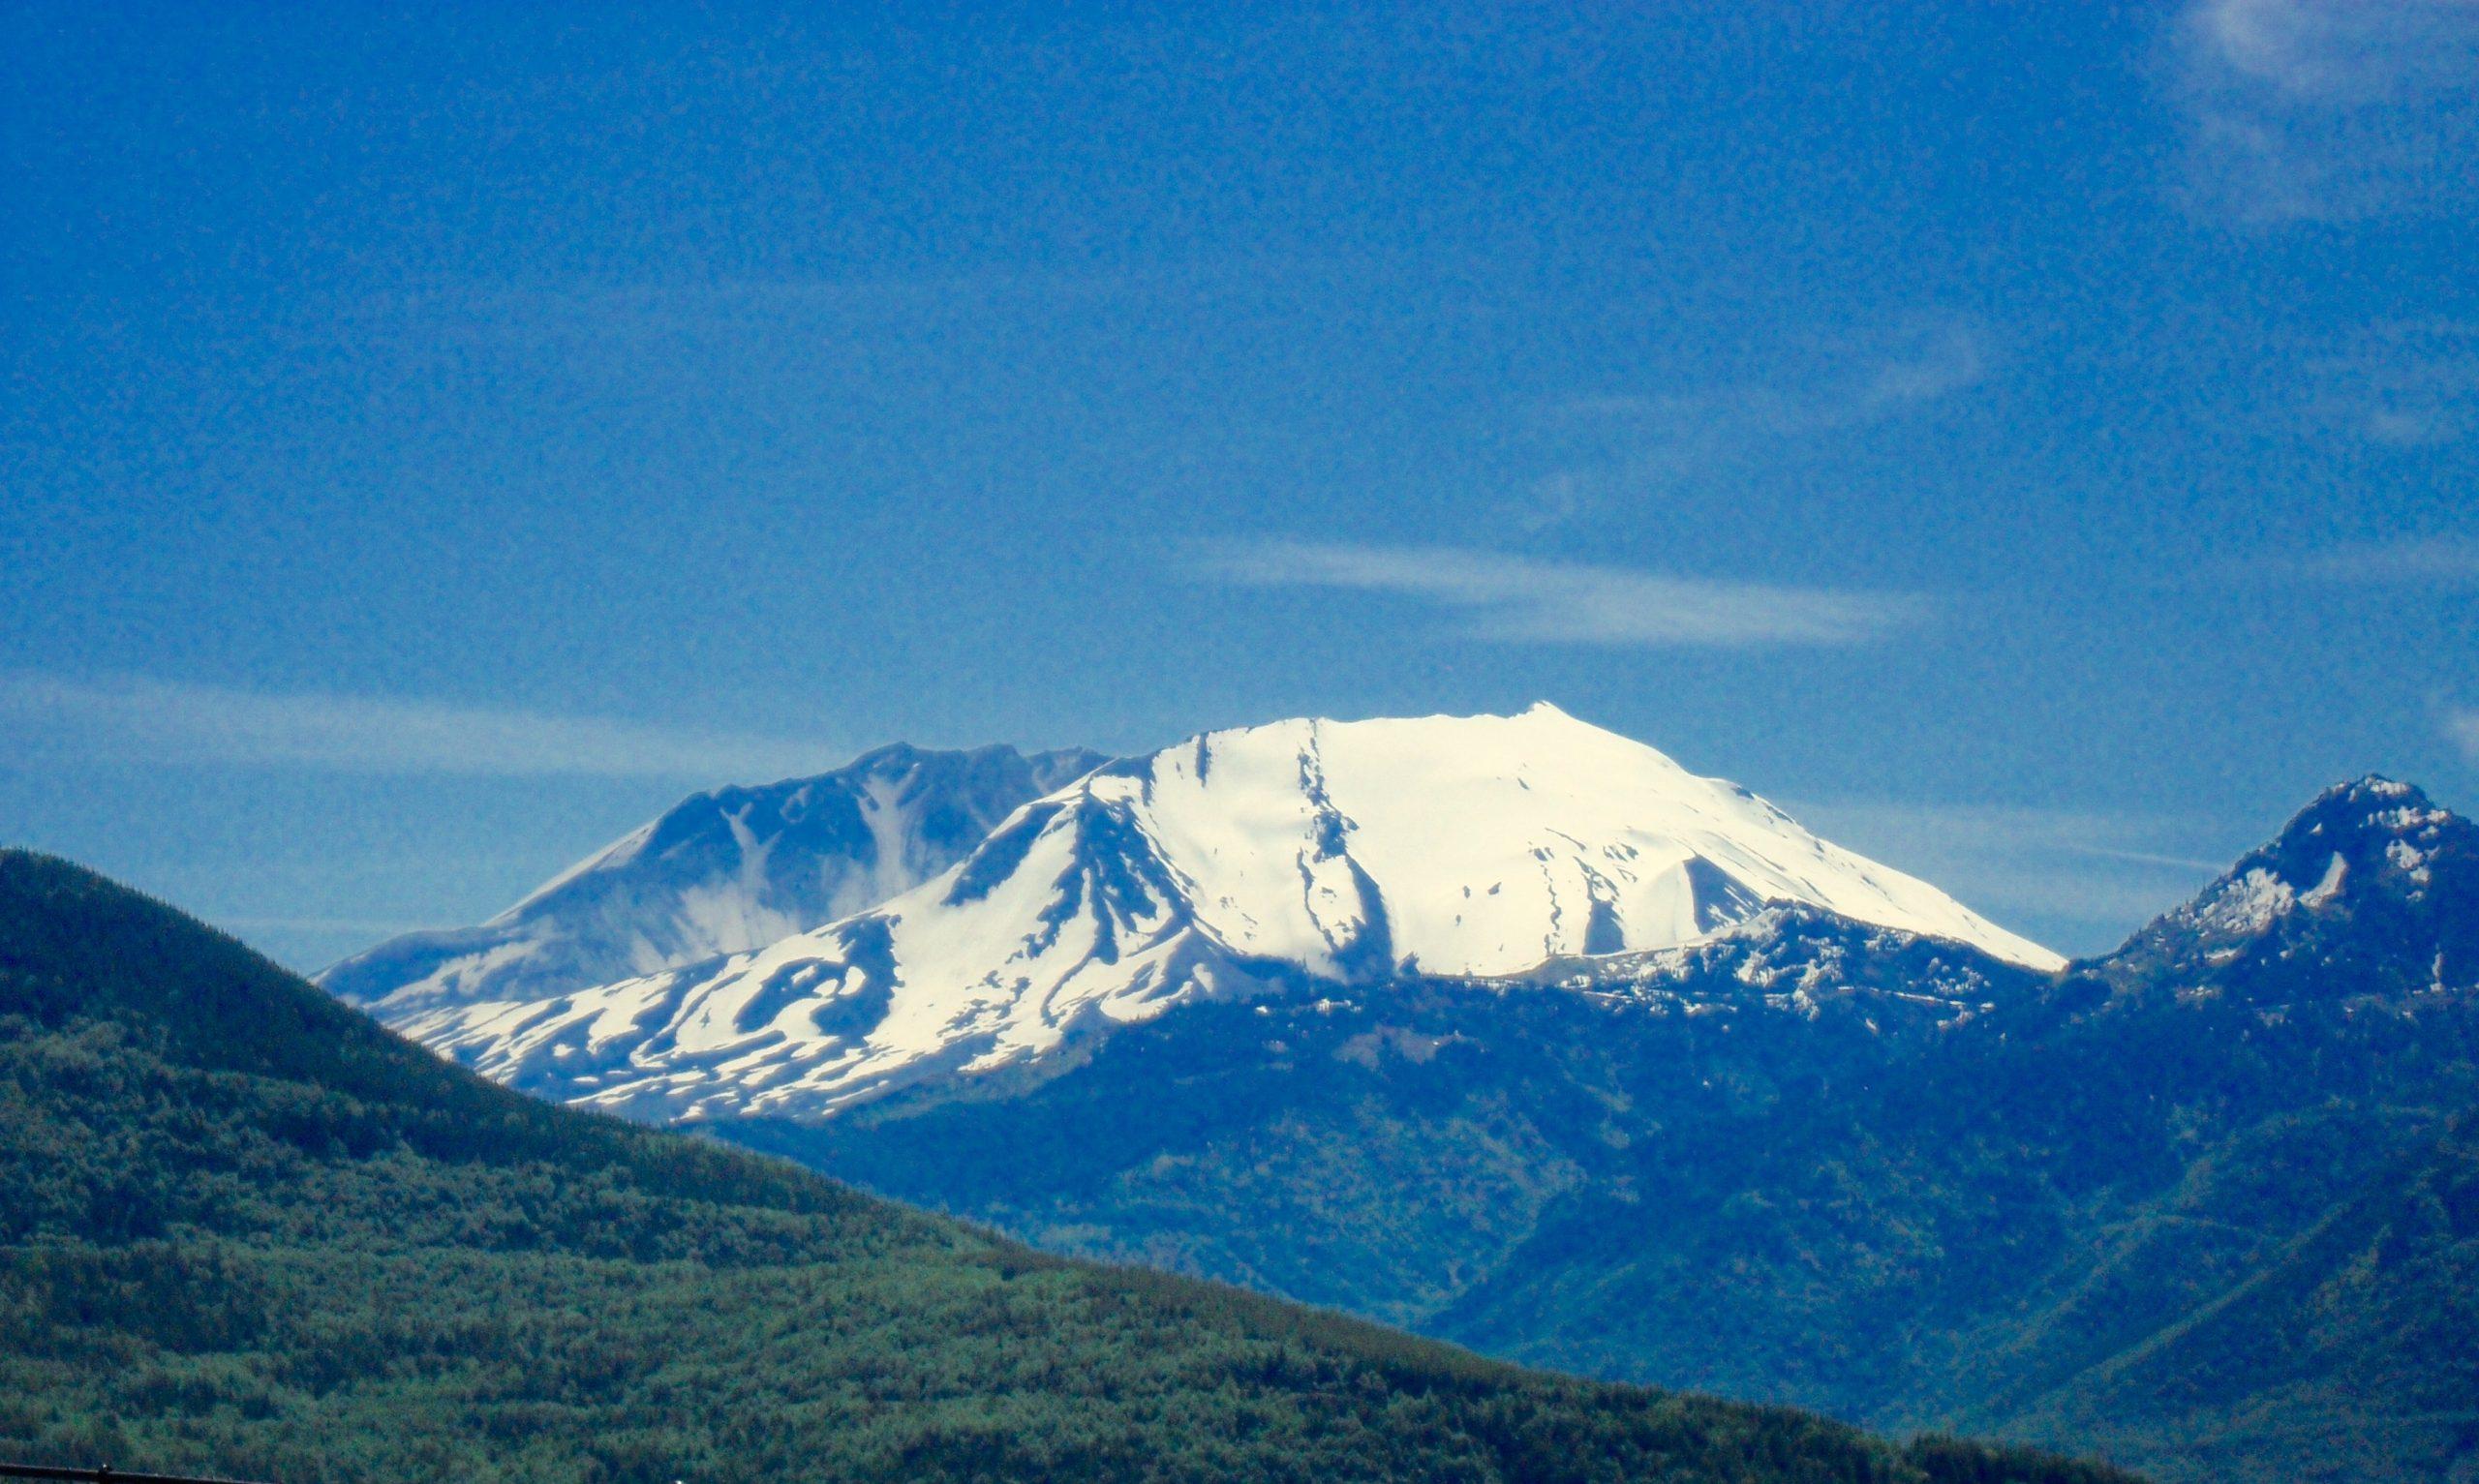 Snowcapped Mt. St. Helens